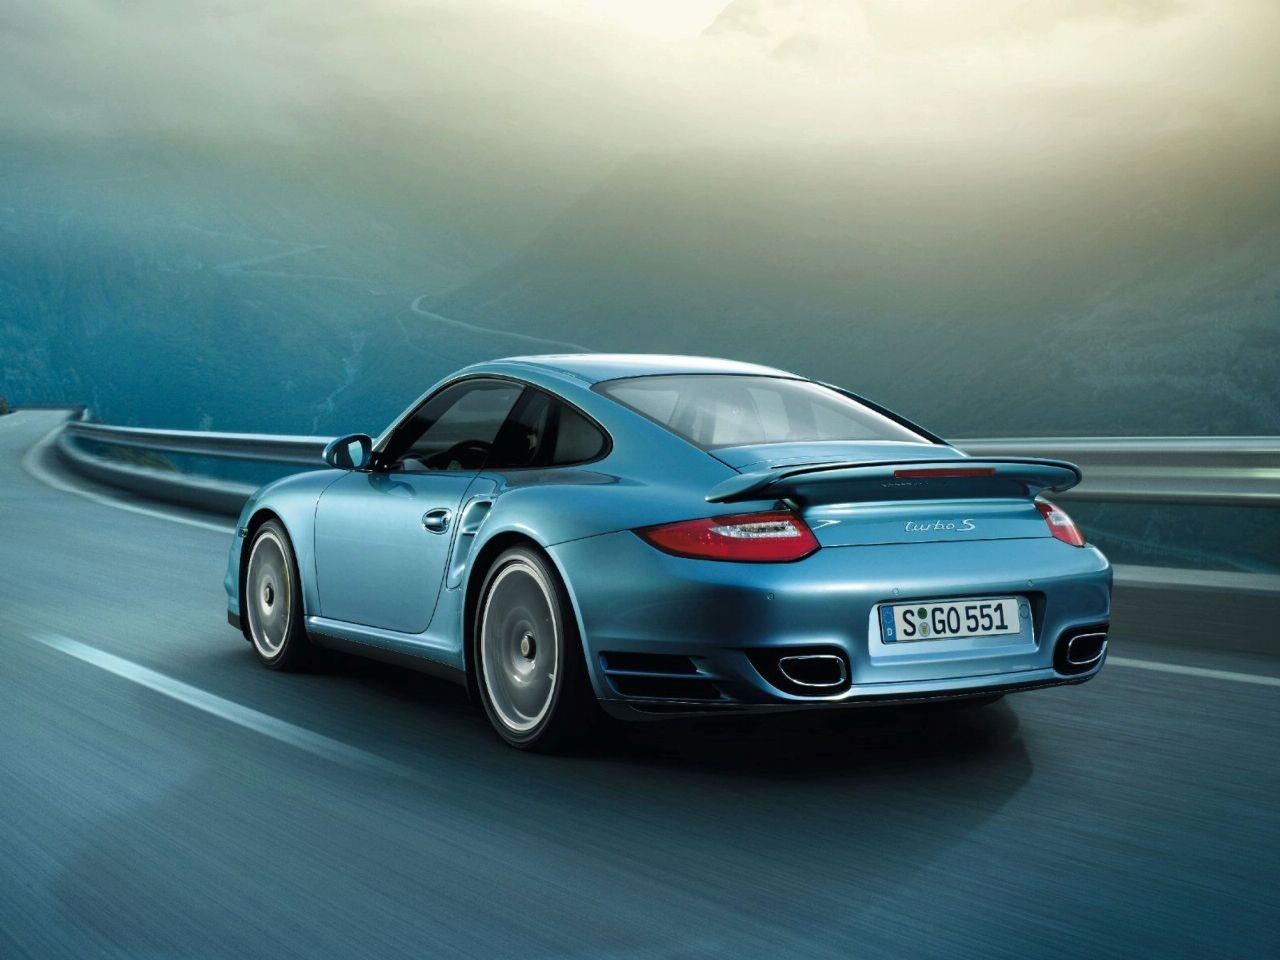 2011 porsche 911 turbo s w 530hp revealed. Black Bedroom Furniture Sets. Home Design Ideas